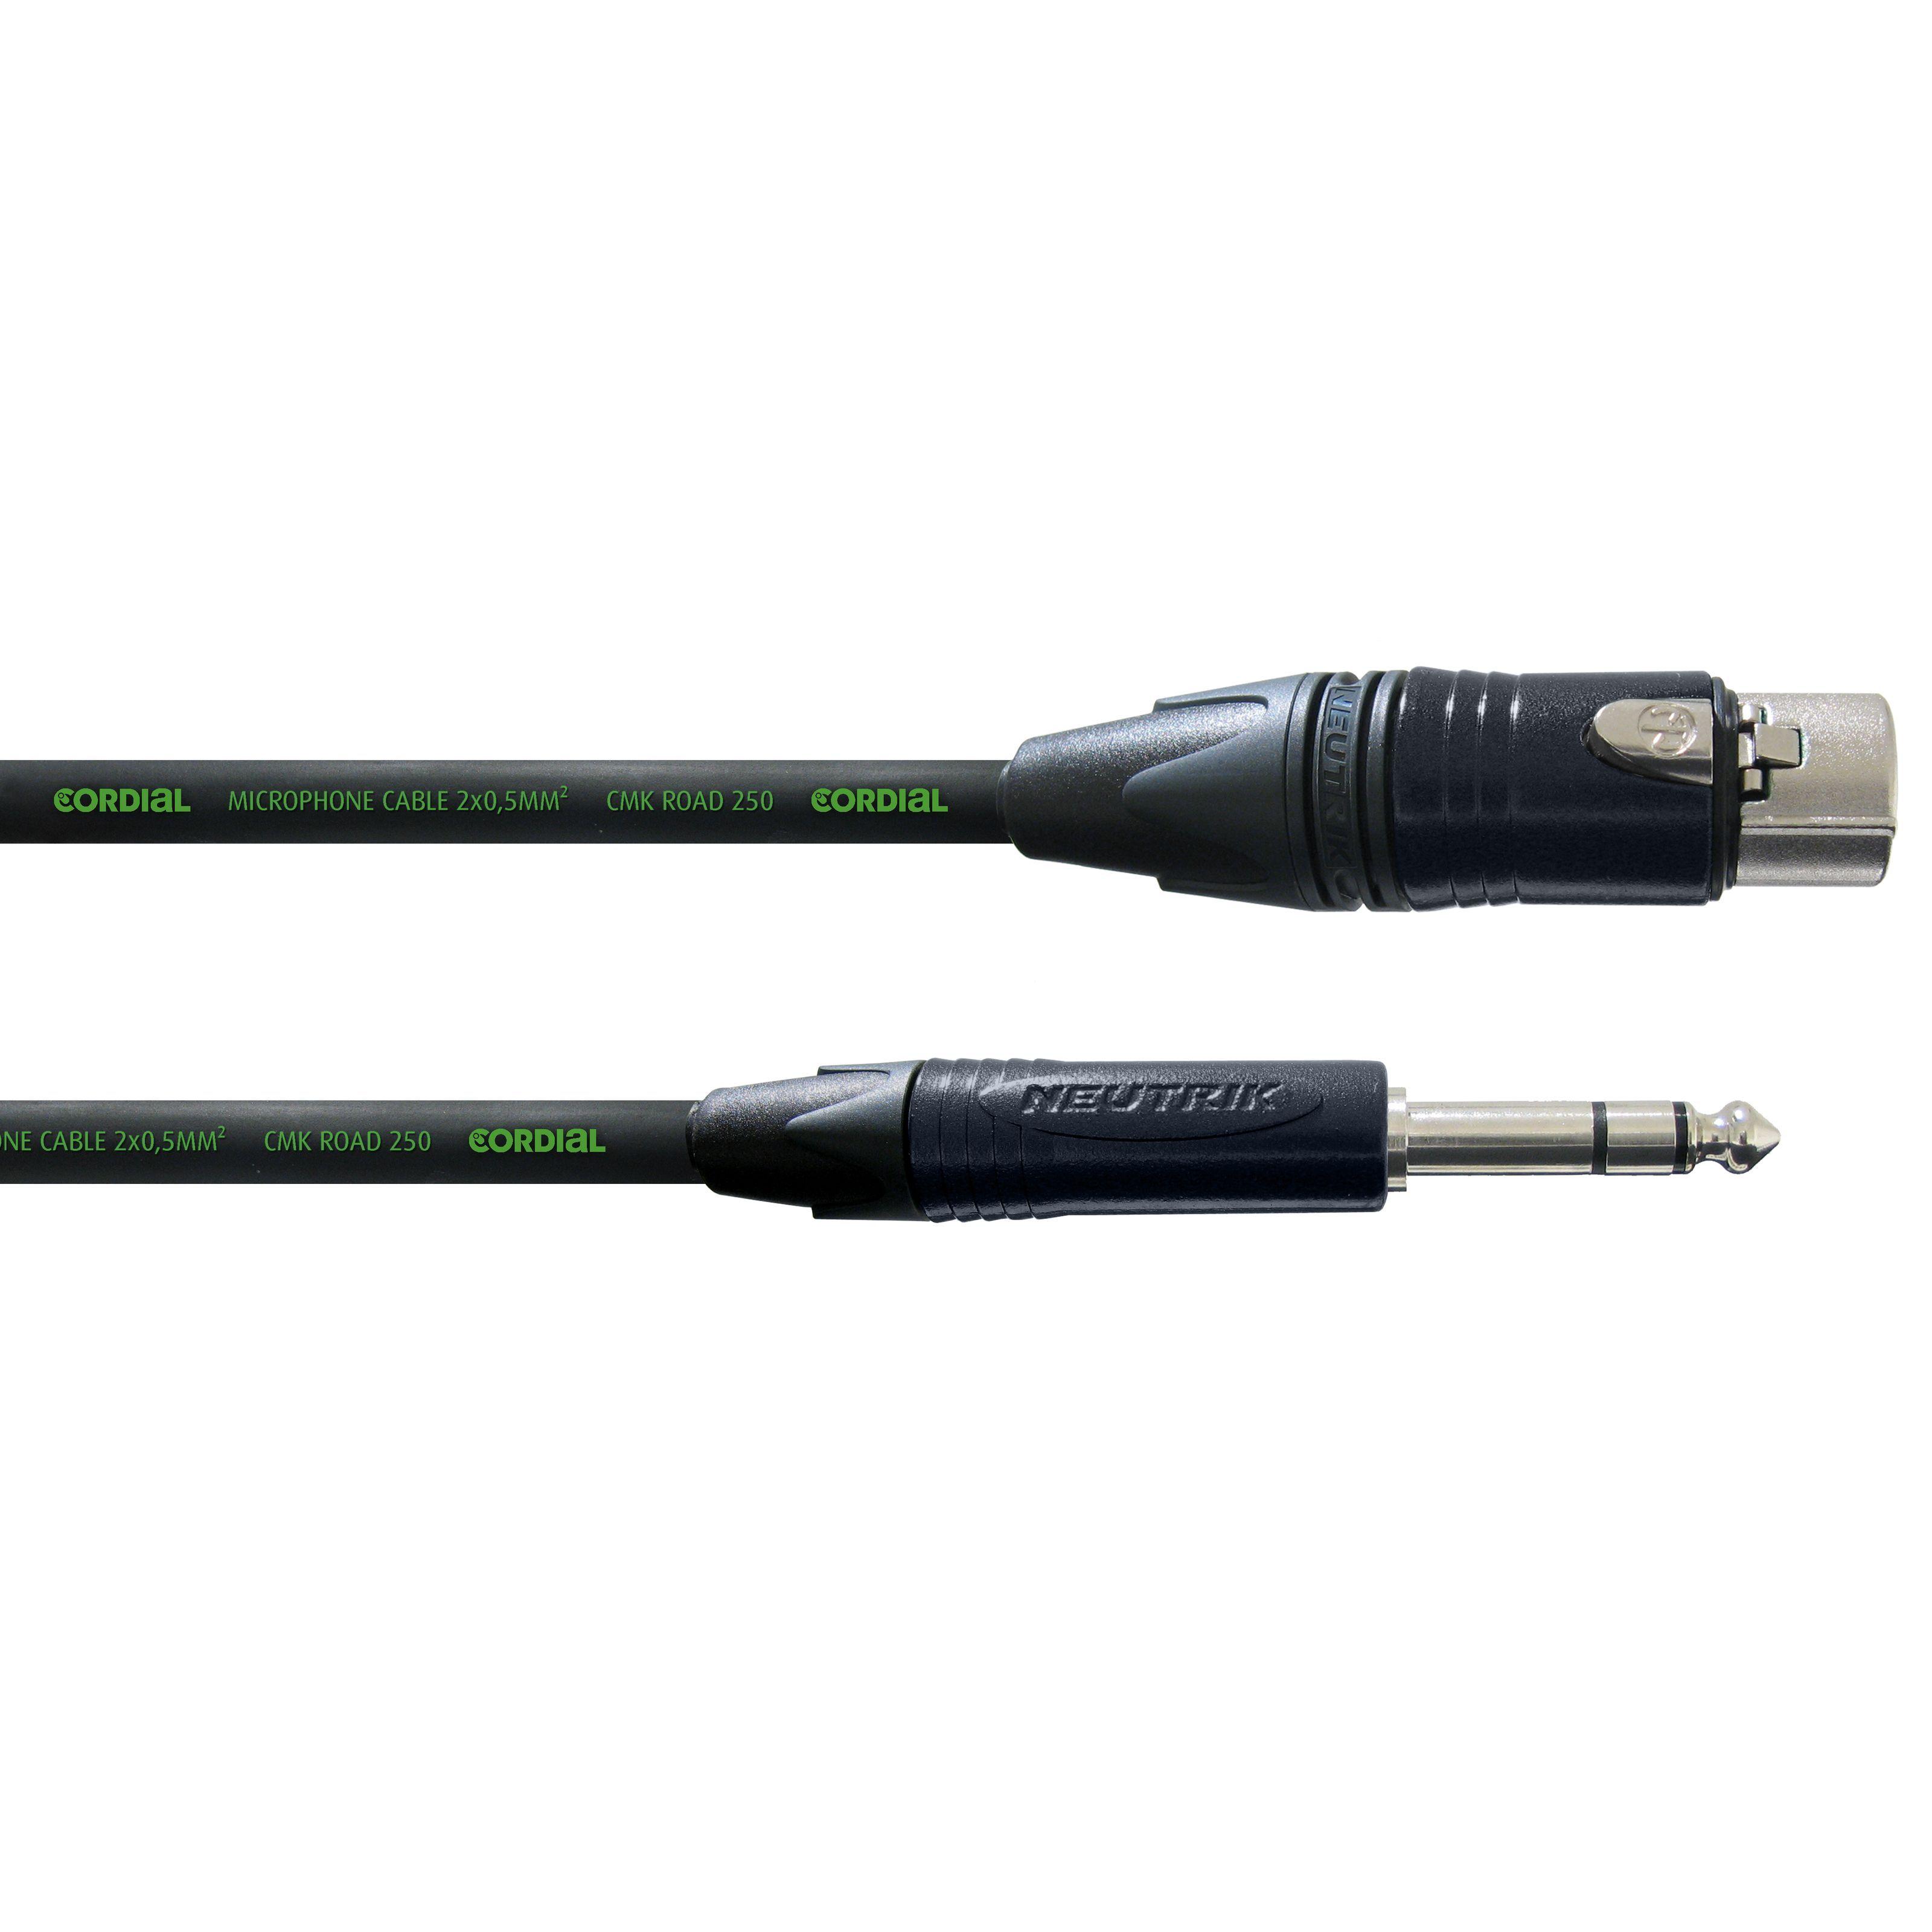 Cordial CRM 5 FV encore Mircophone Cable XLR female - Jack stereo 5m Neutrik